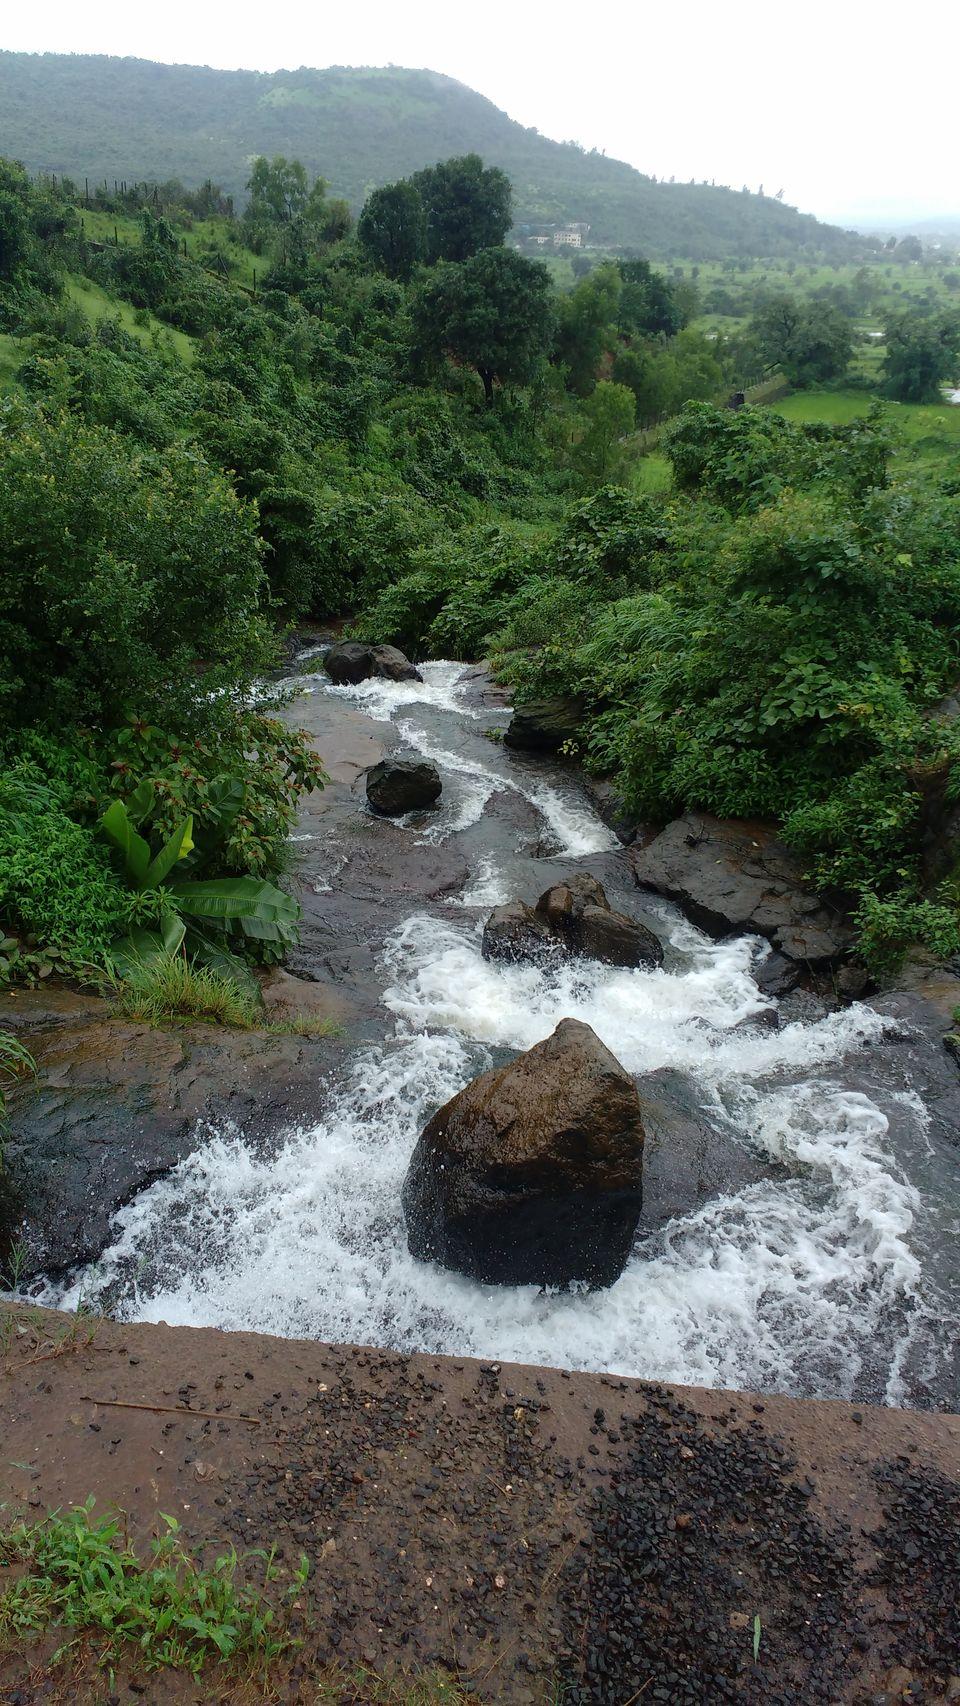 Photo of Malavli, Maharashtra, India by theuncanny_traveller